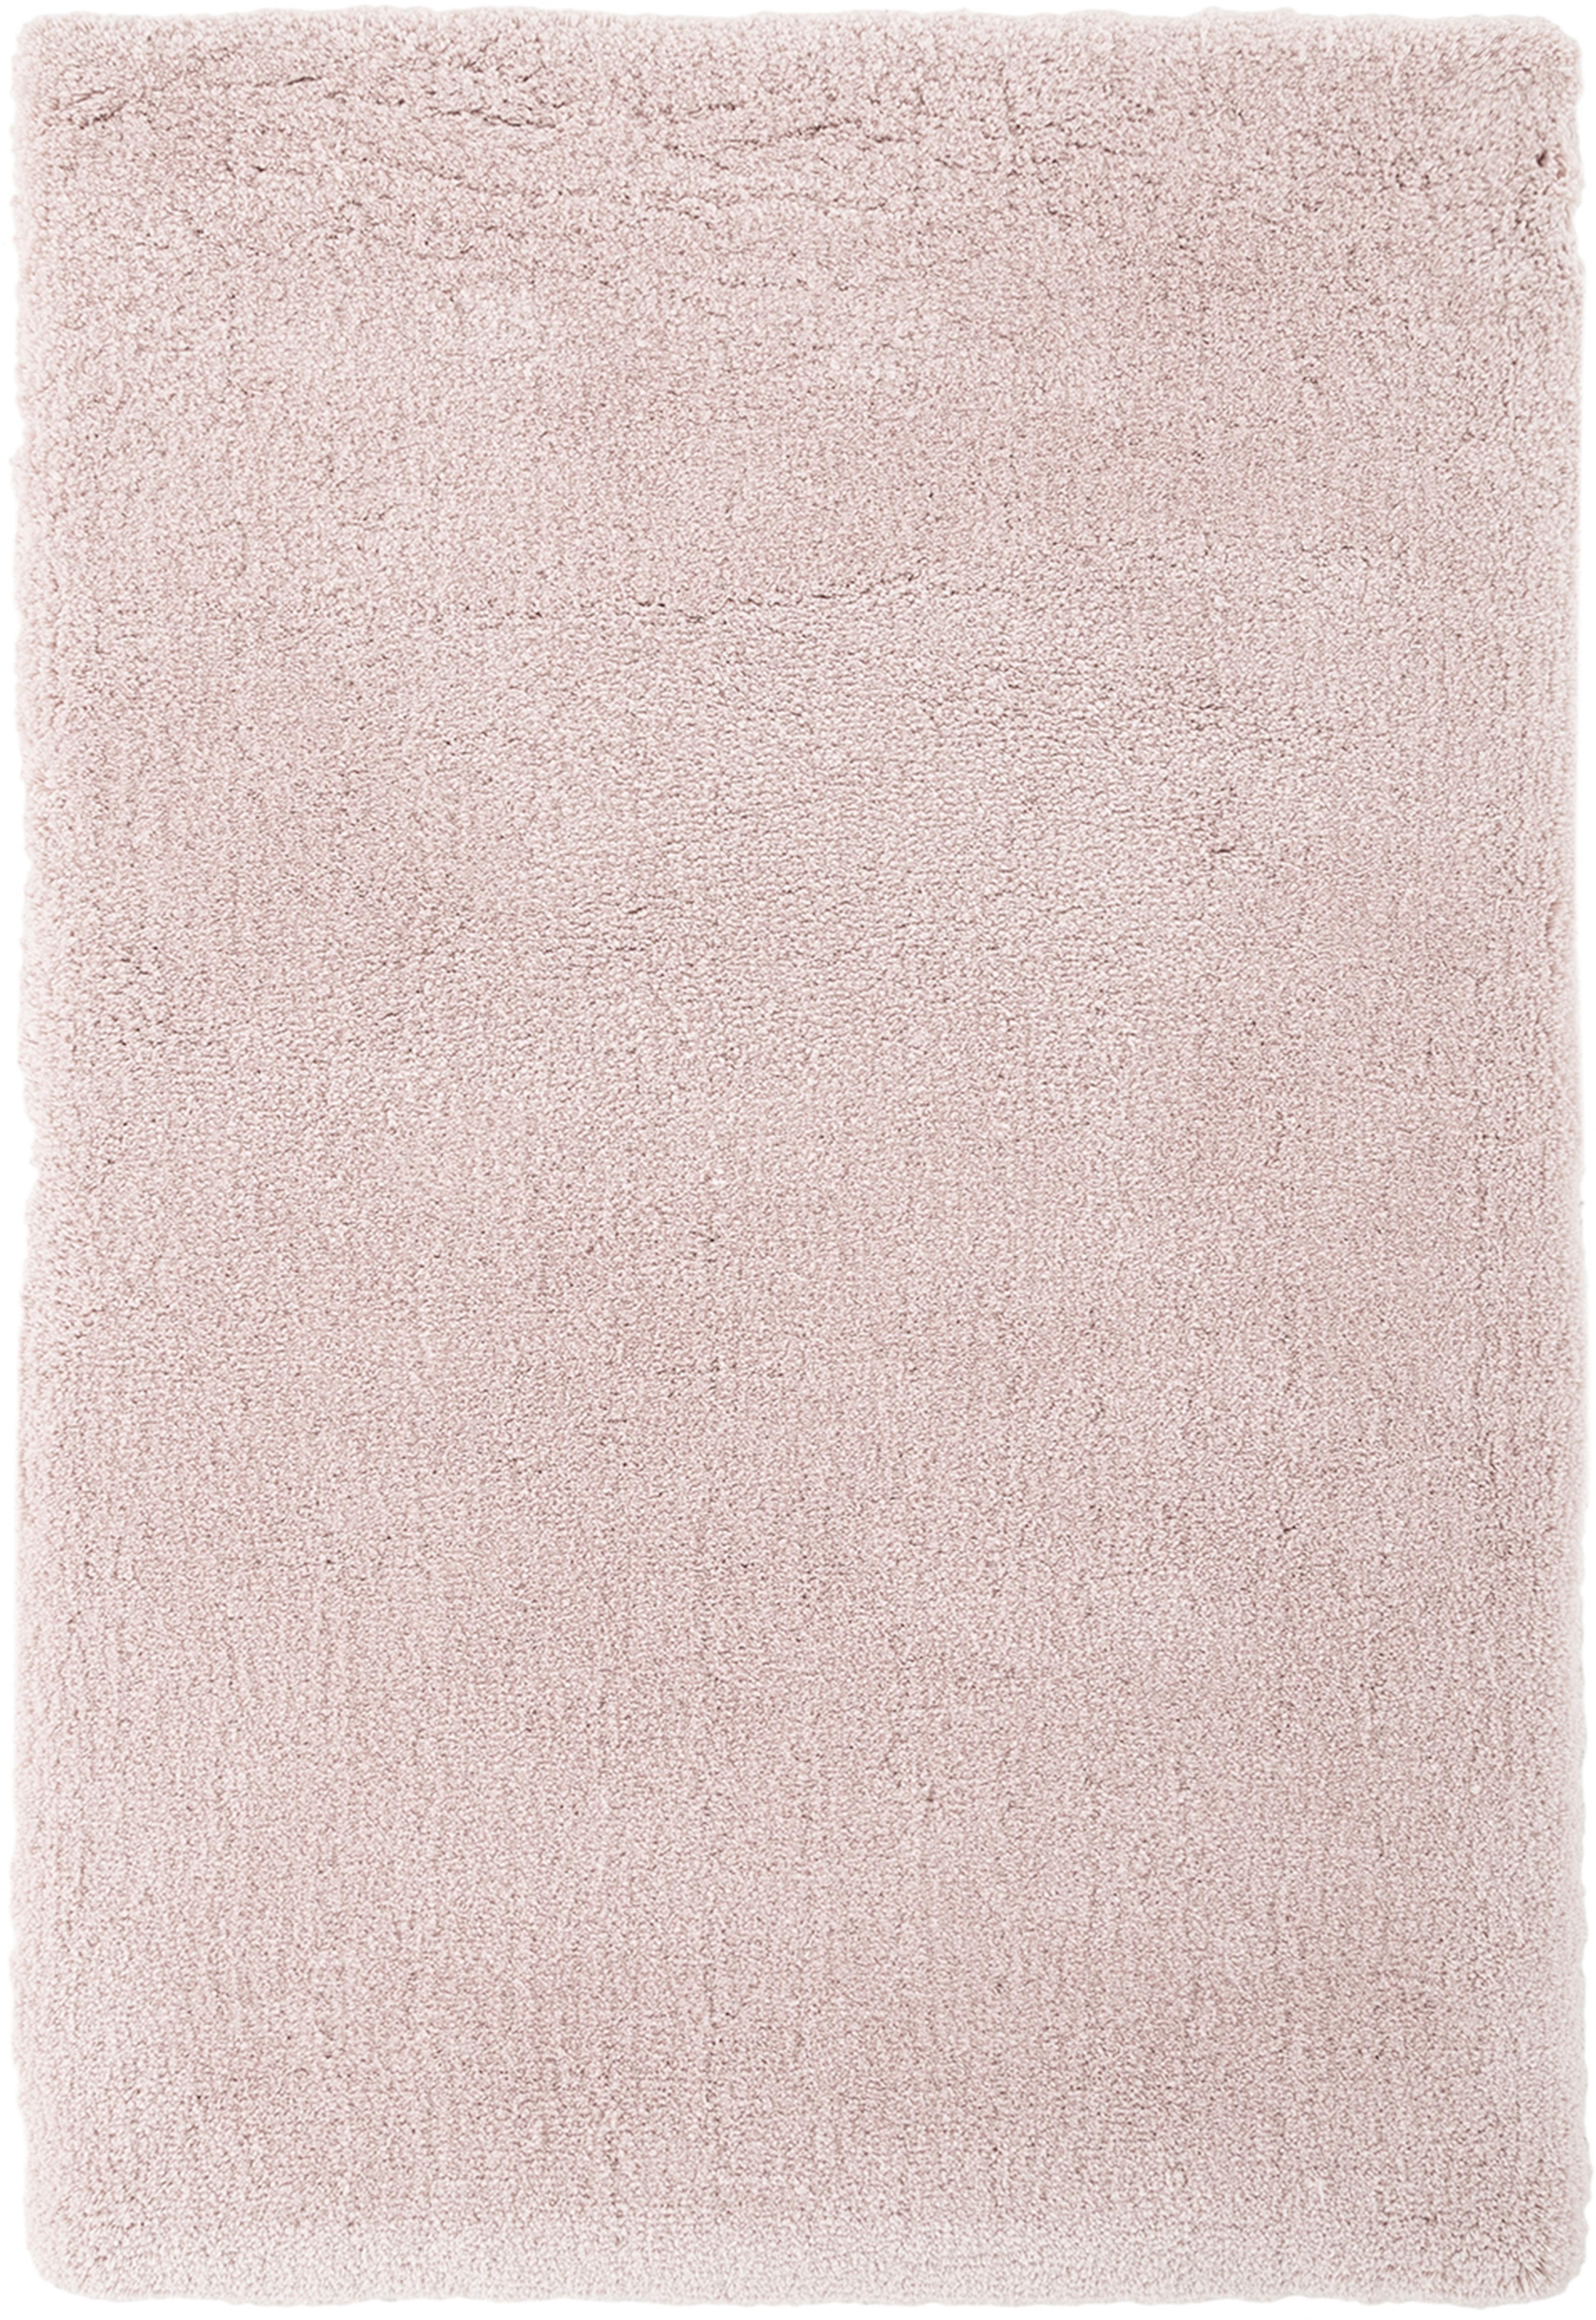 Flauschiger Hochflor-Teppich Leighton in Rosa, Flor: 100% Polyester (Mikrofase, Rosé, B 160 x L 230 cm (Grösse M)